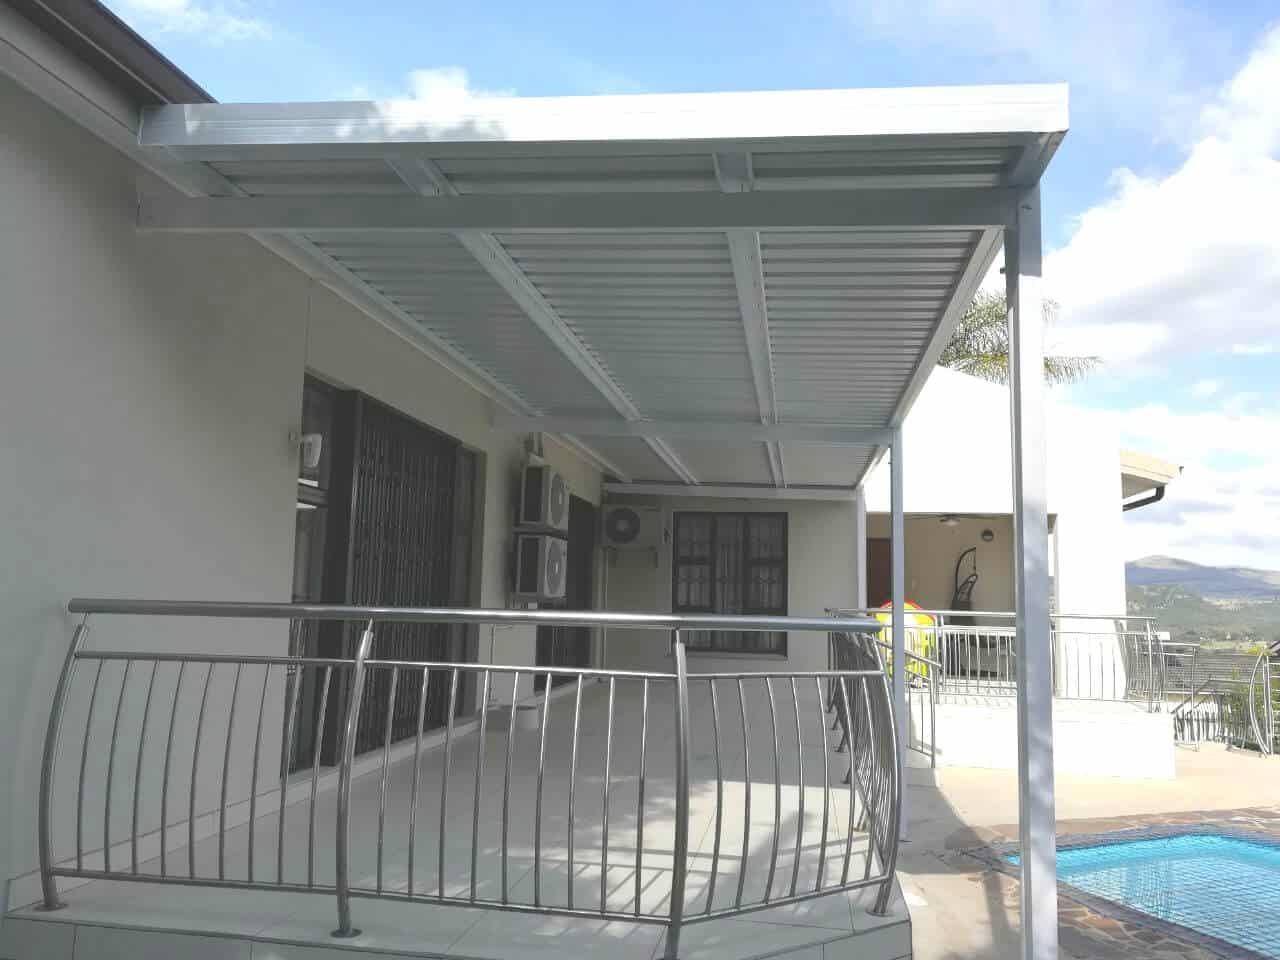 Venetian Blind Centre Is Based In Pietermaritzburg South